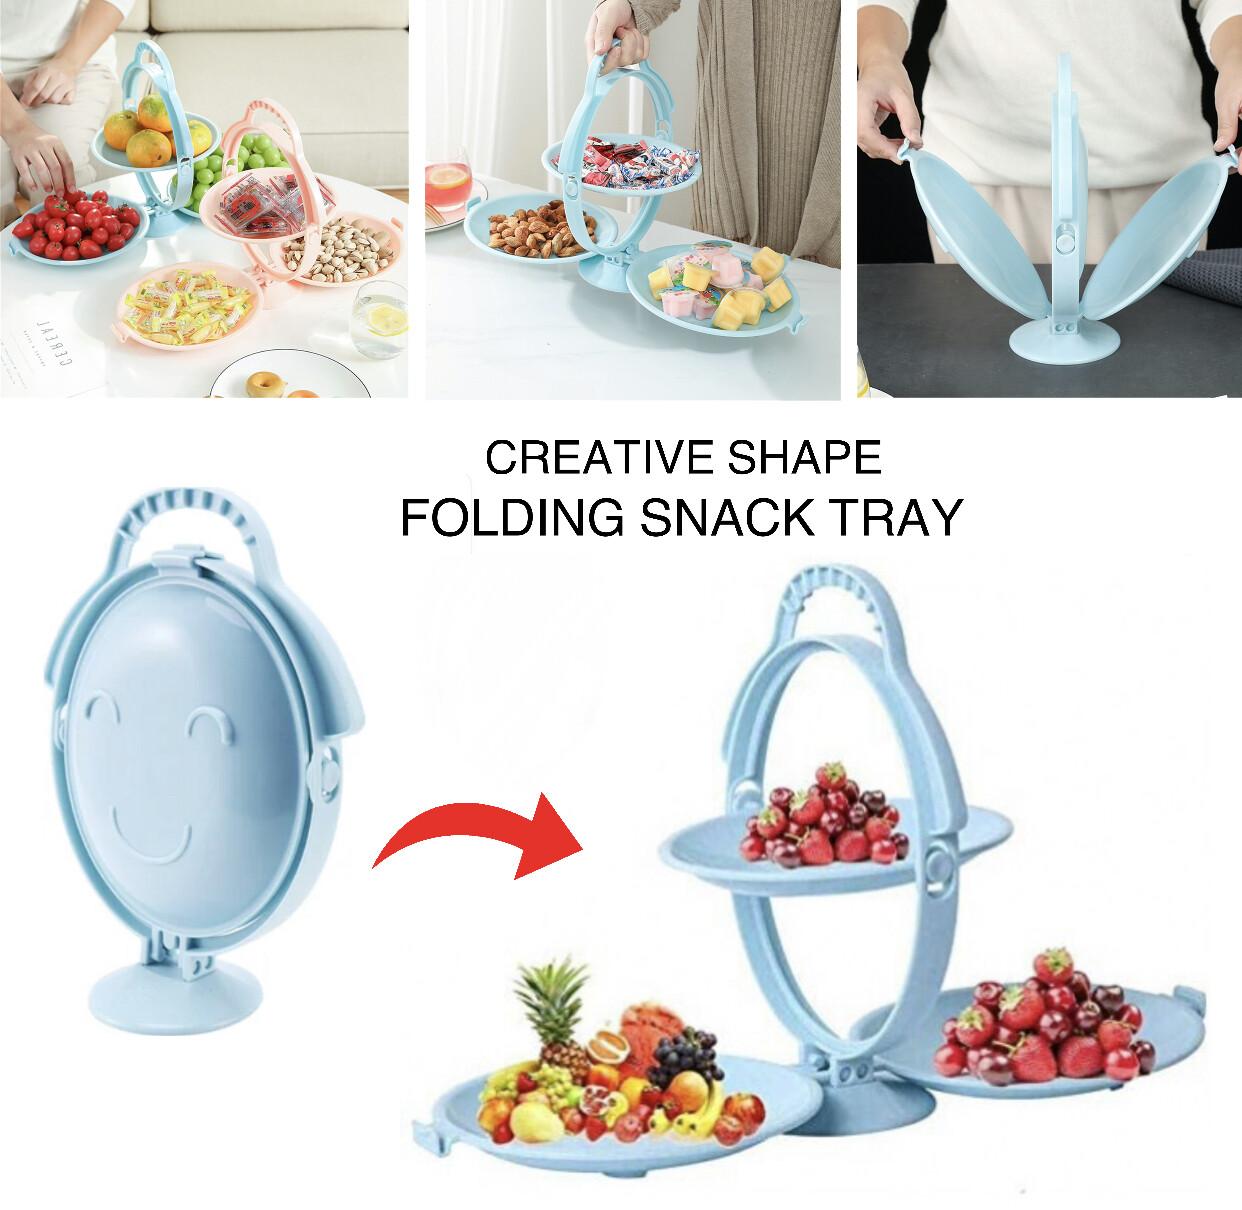 3-Ply Snack Tray